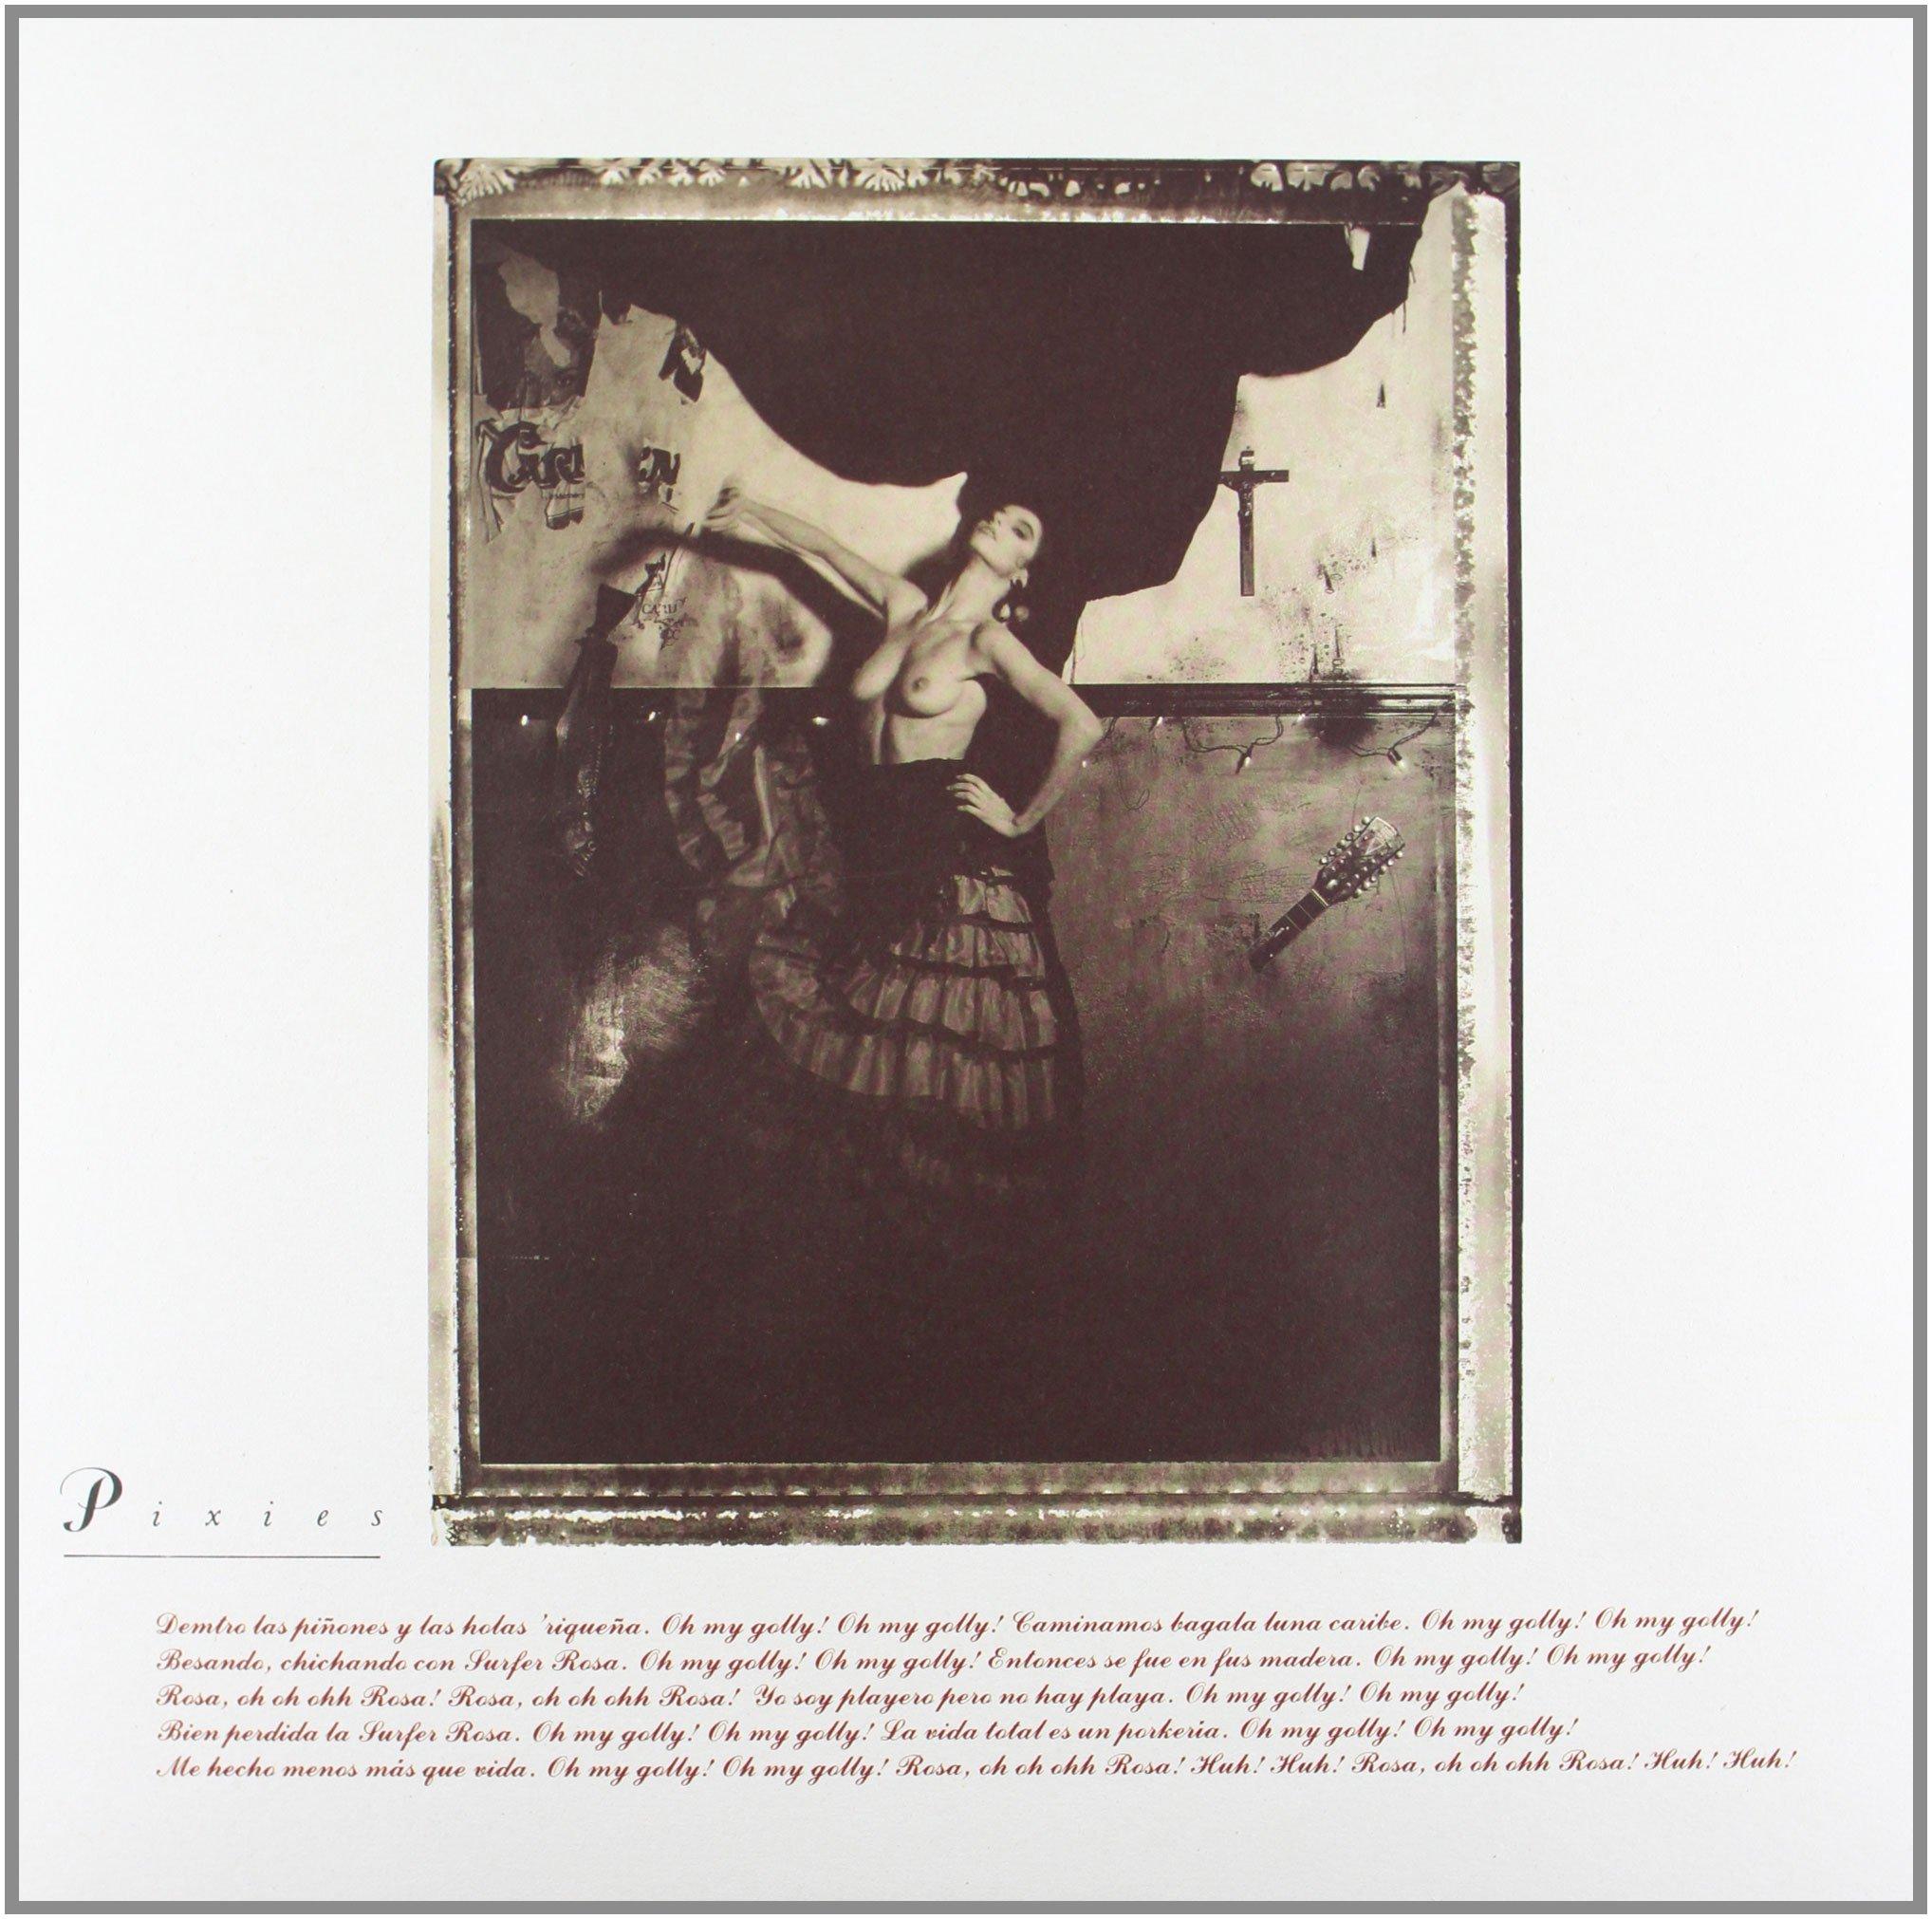 SURFER ROSA [Vinyl] by 4AD